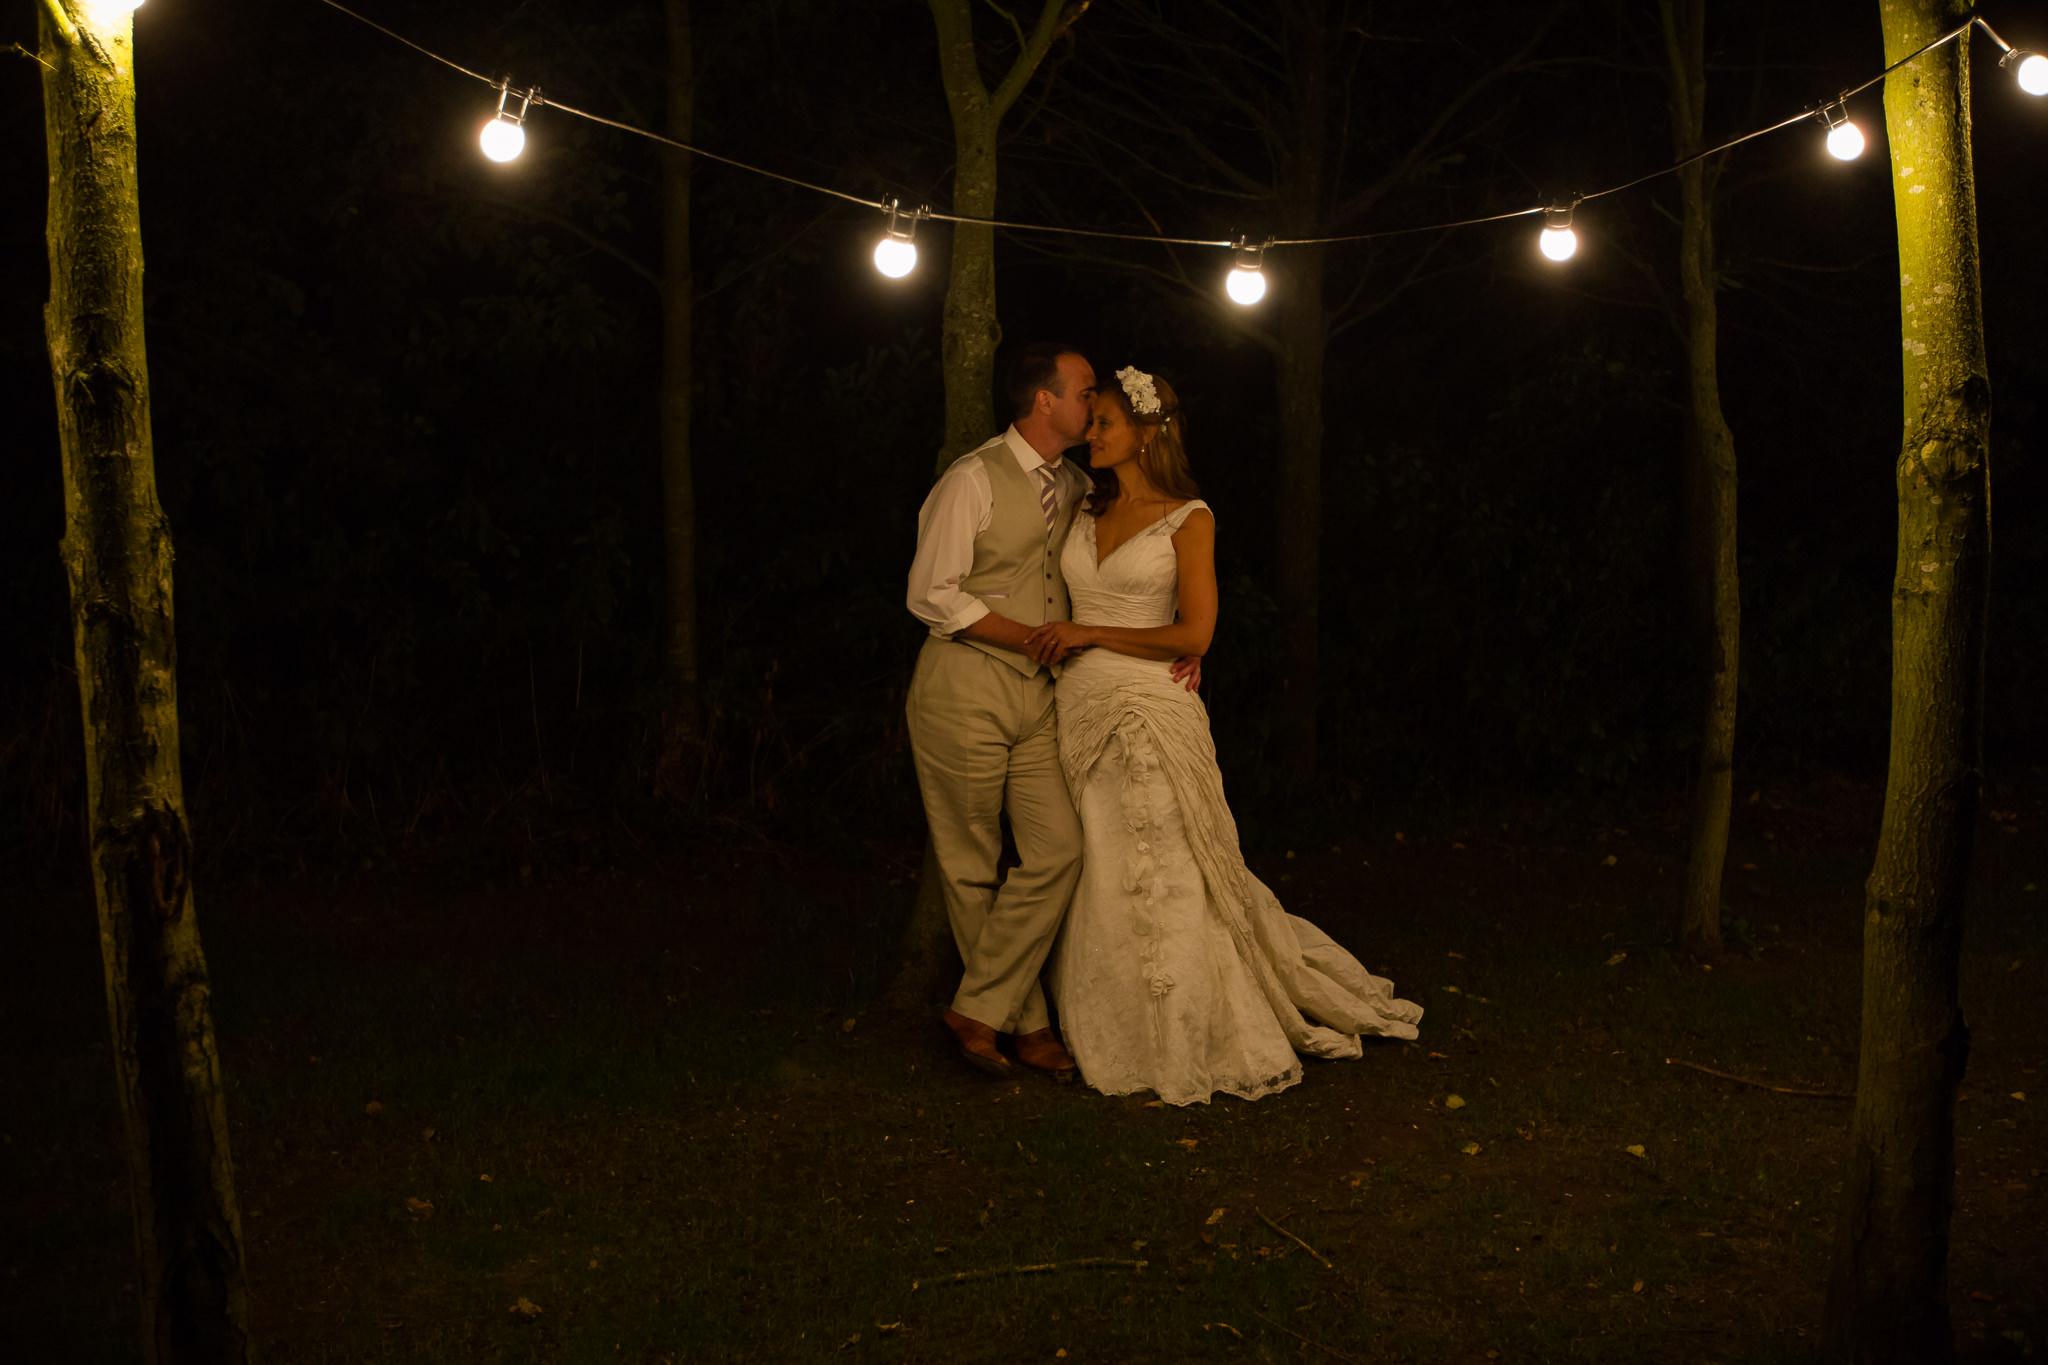 Documentary-style-wedding-photography